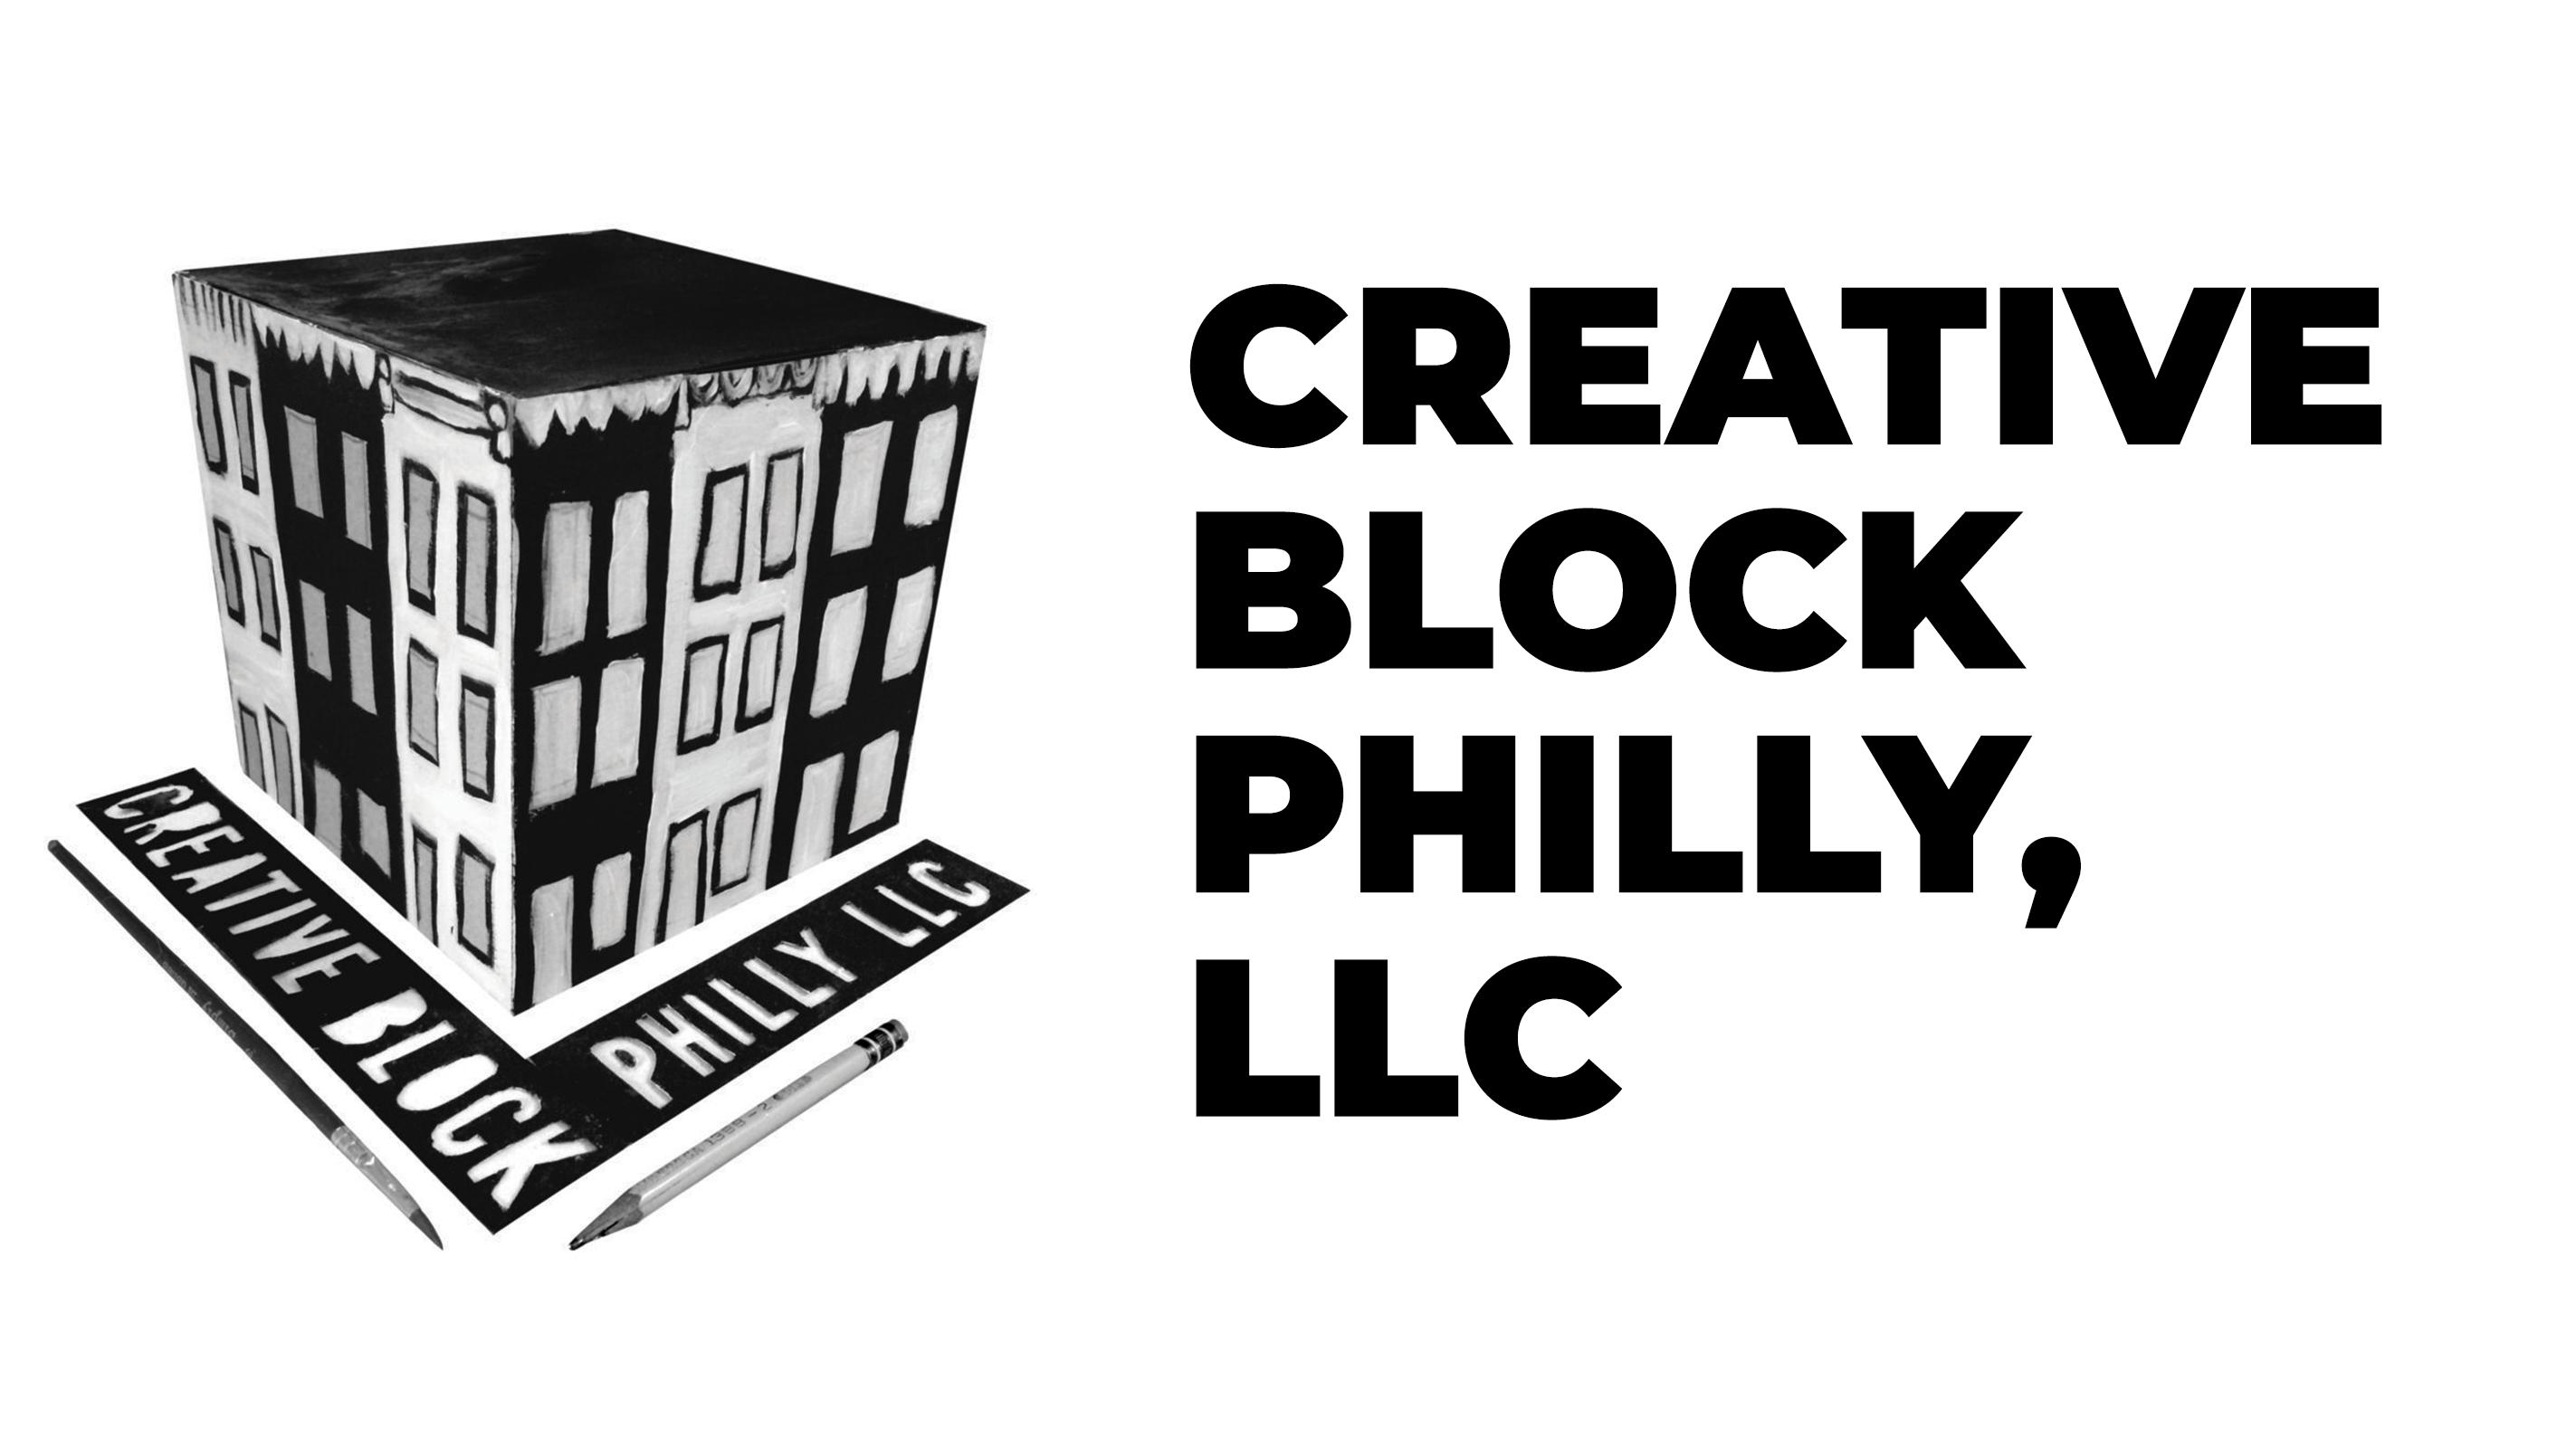 Creative Block Philly